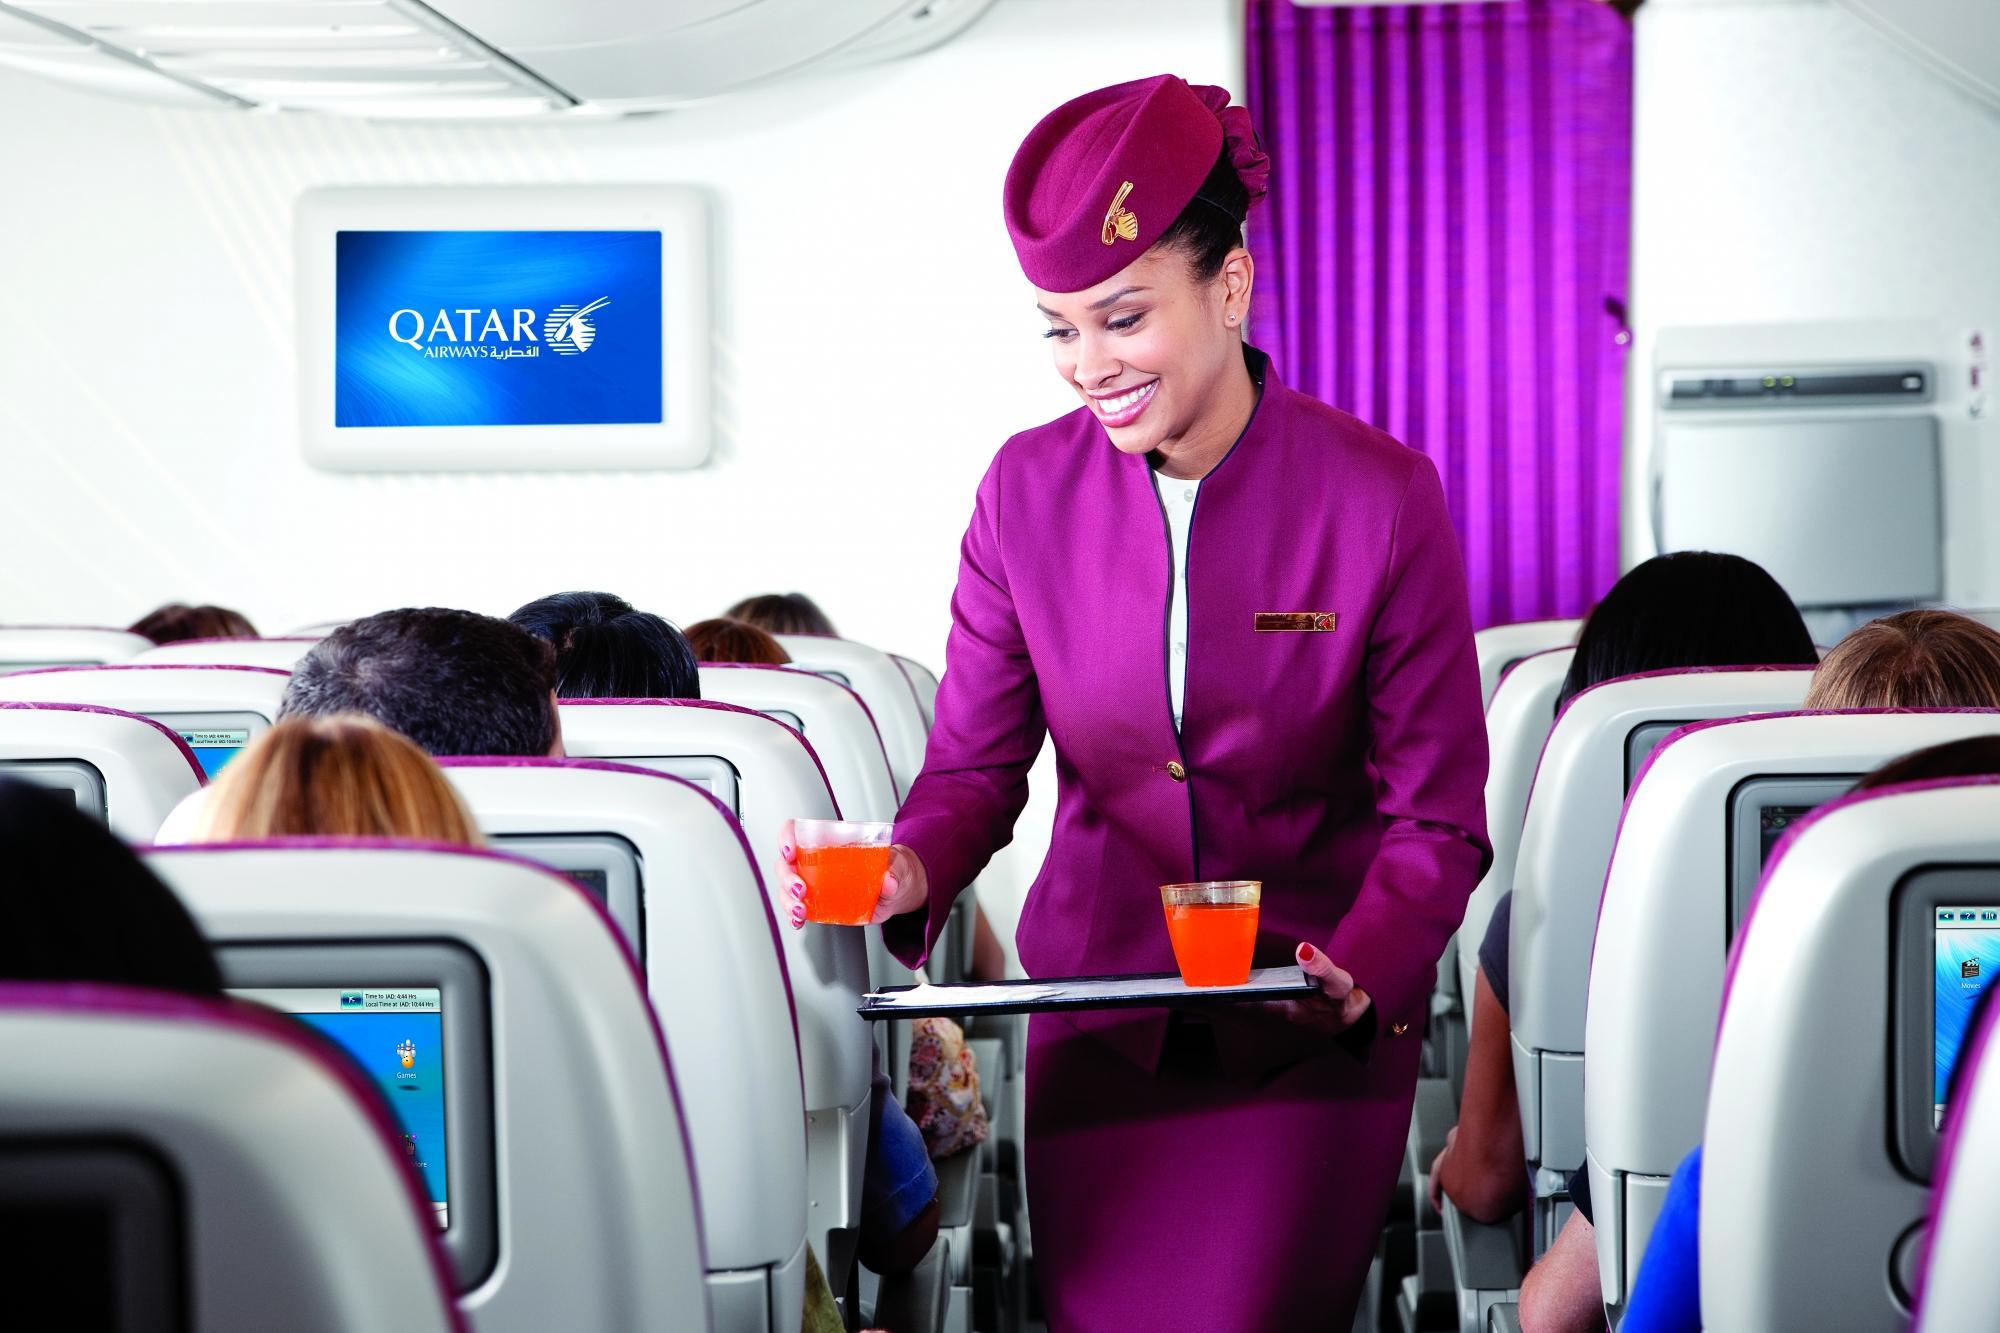 Qatar Airways reveals customer experience trends at future travel ...